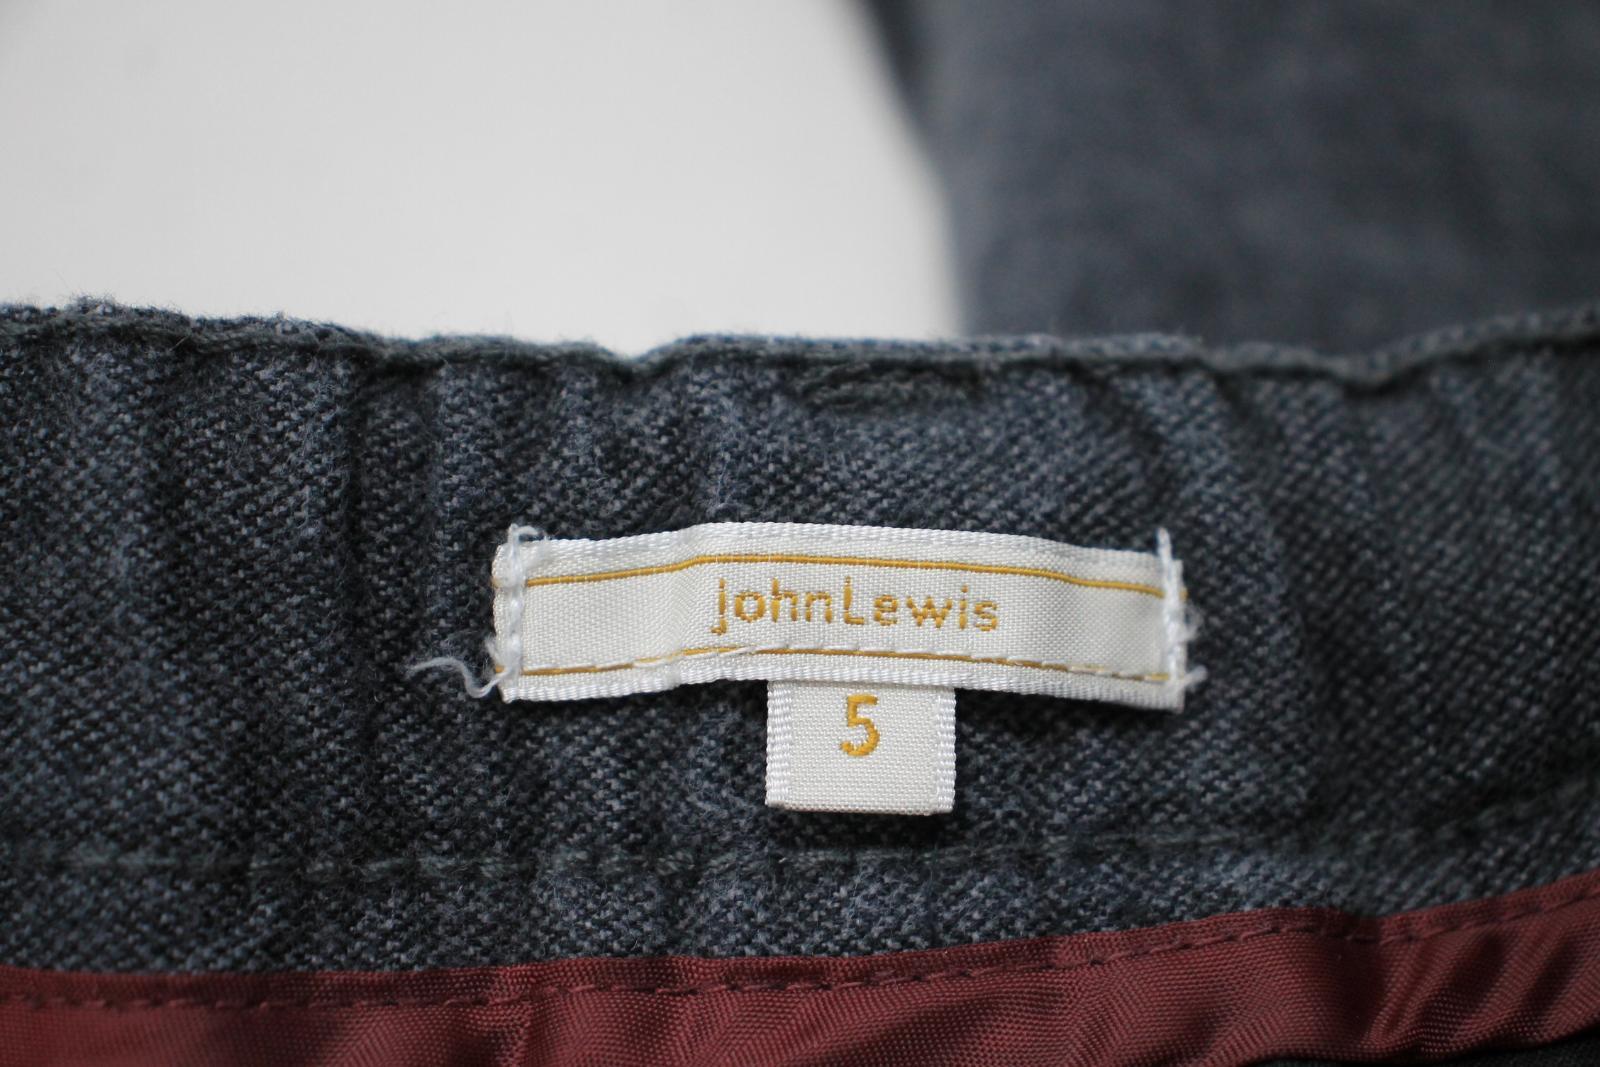 JOHN LEWIS Boy's Dark Grey Elastic Waist Skinny Fit Cotton Trousers 5 Yrs. NEW 6